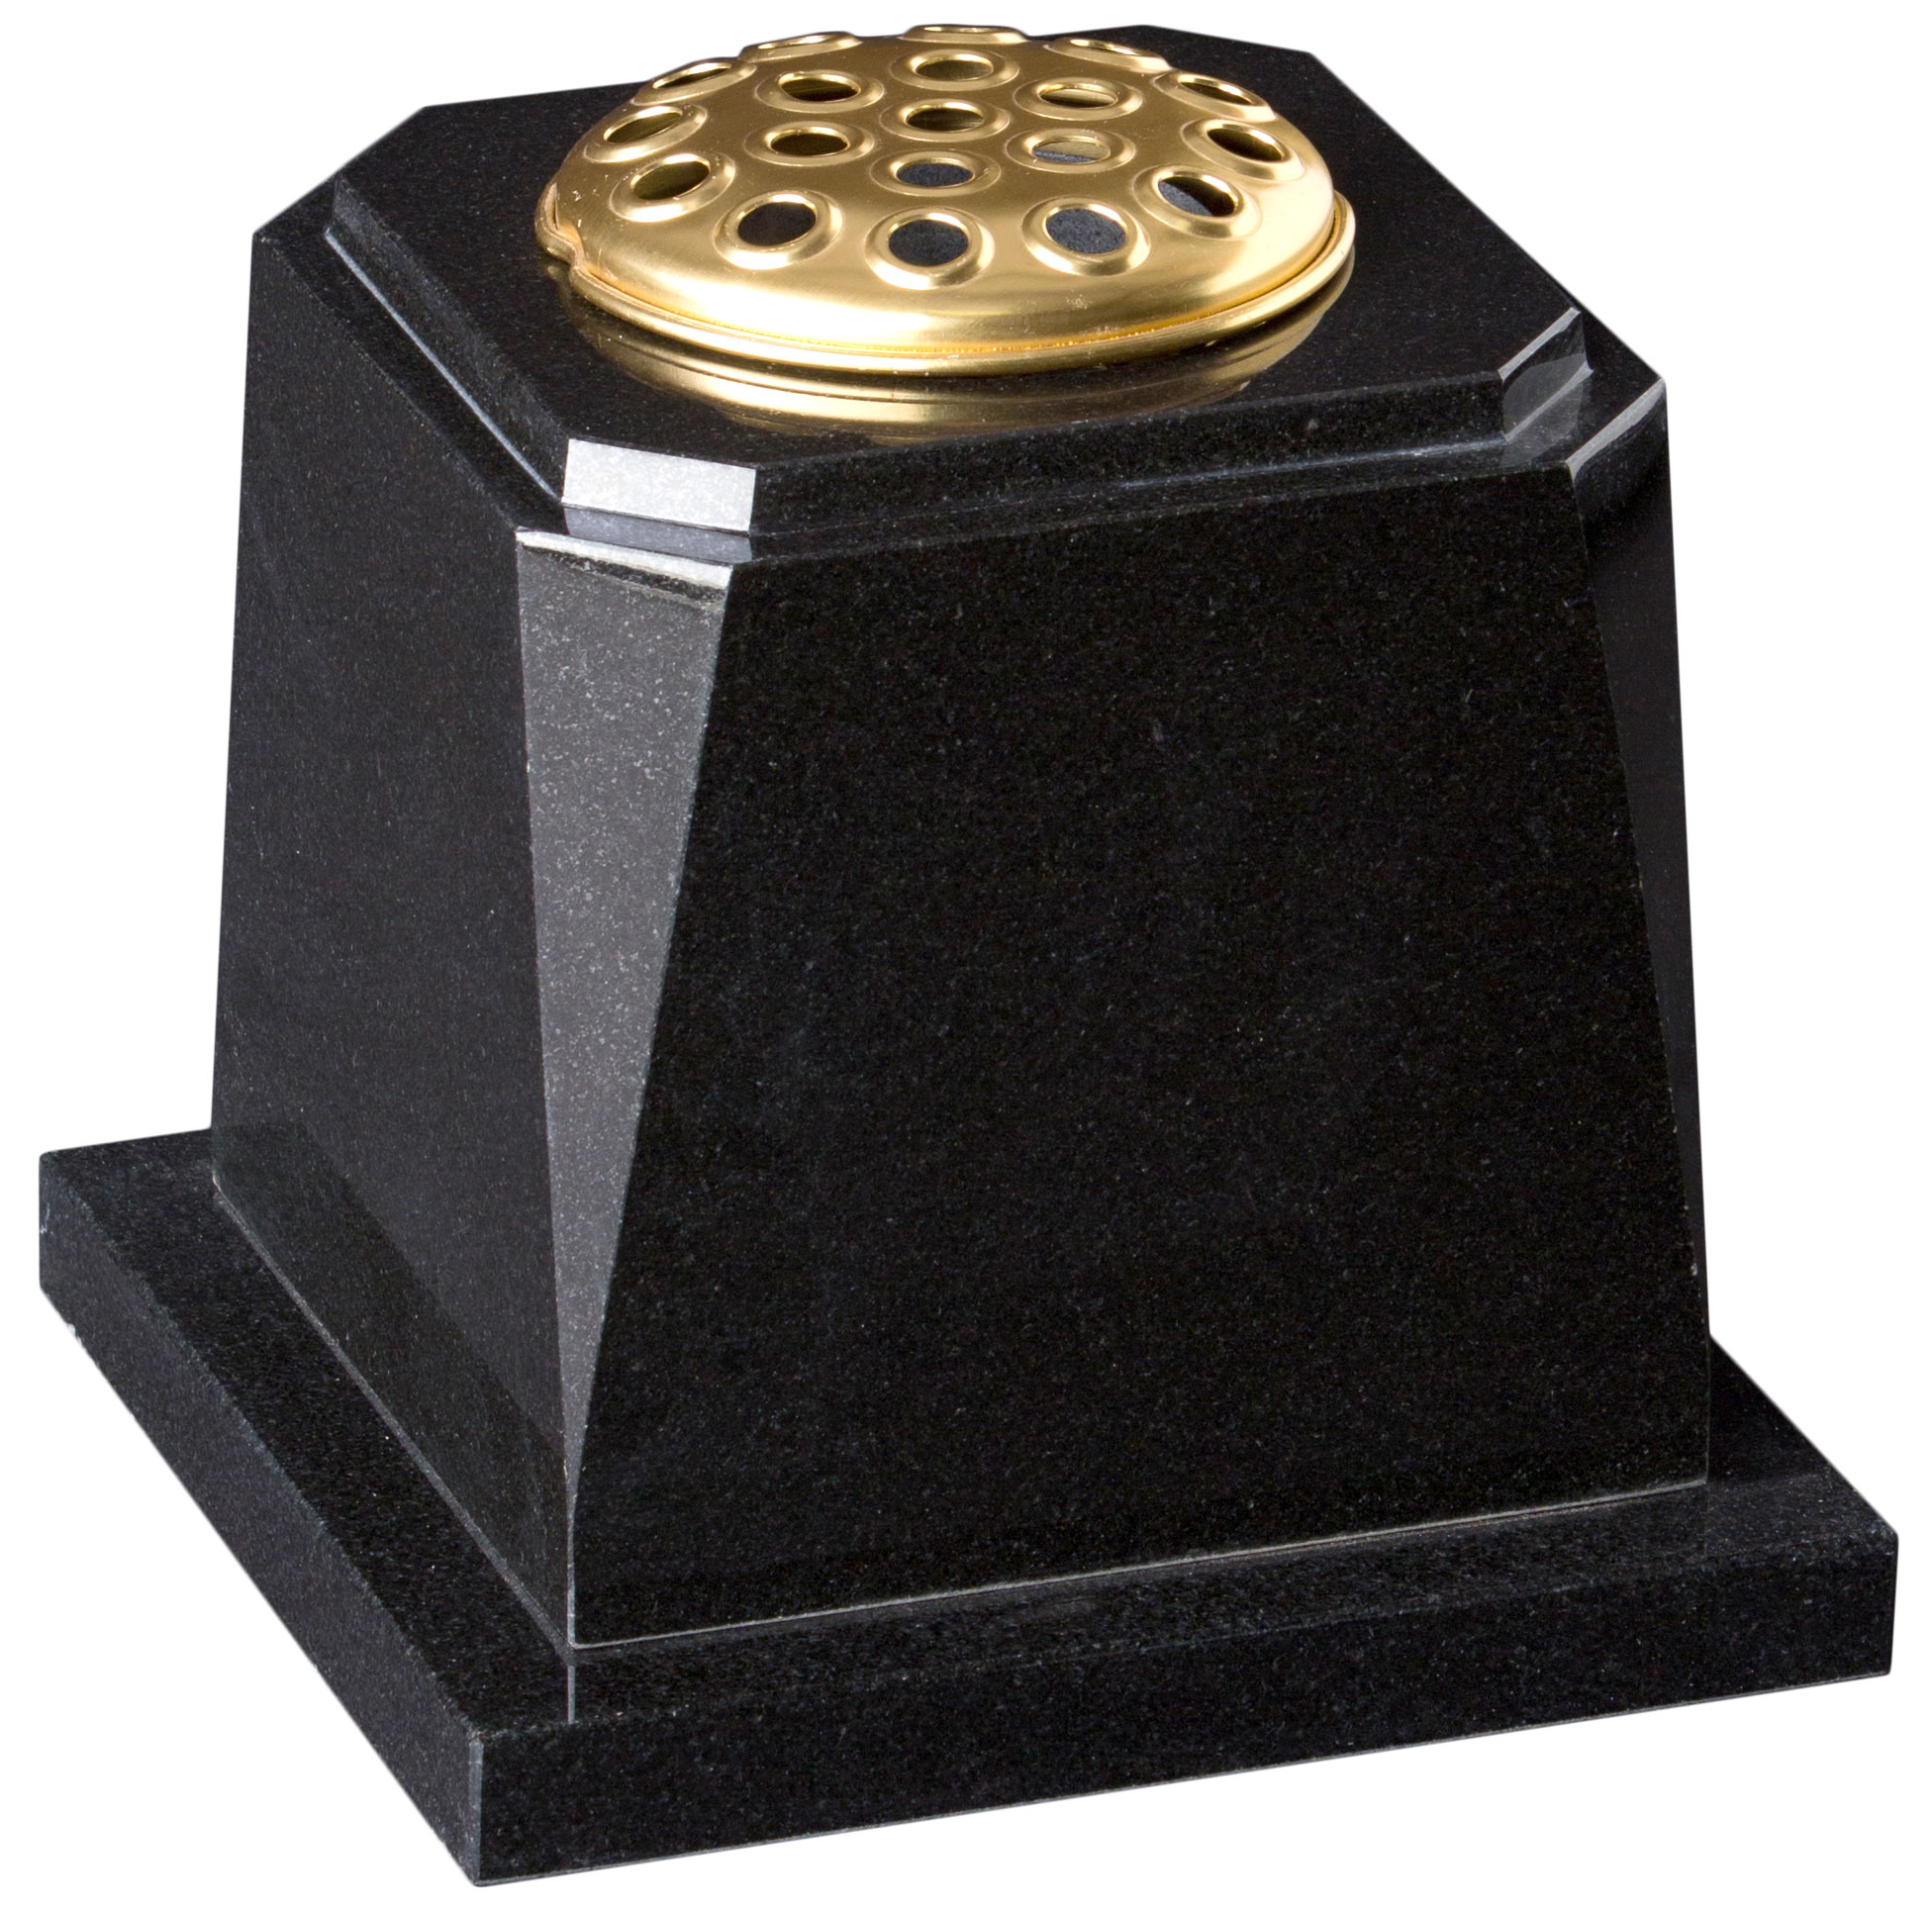 16204 Square vase